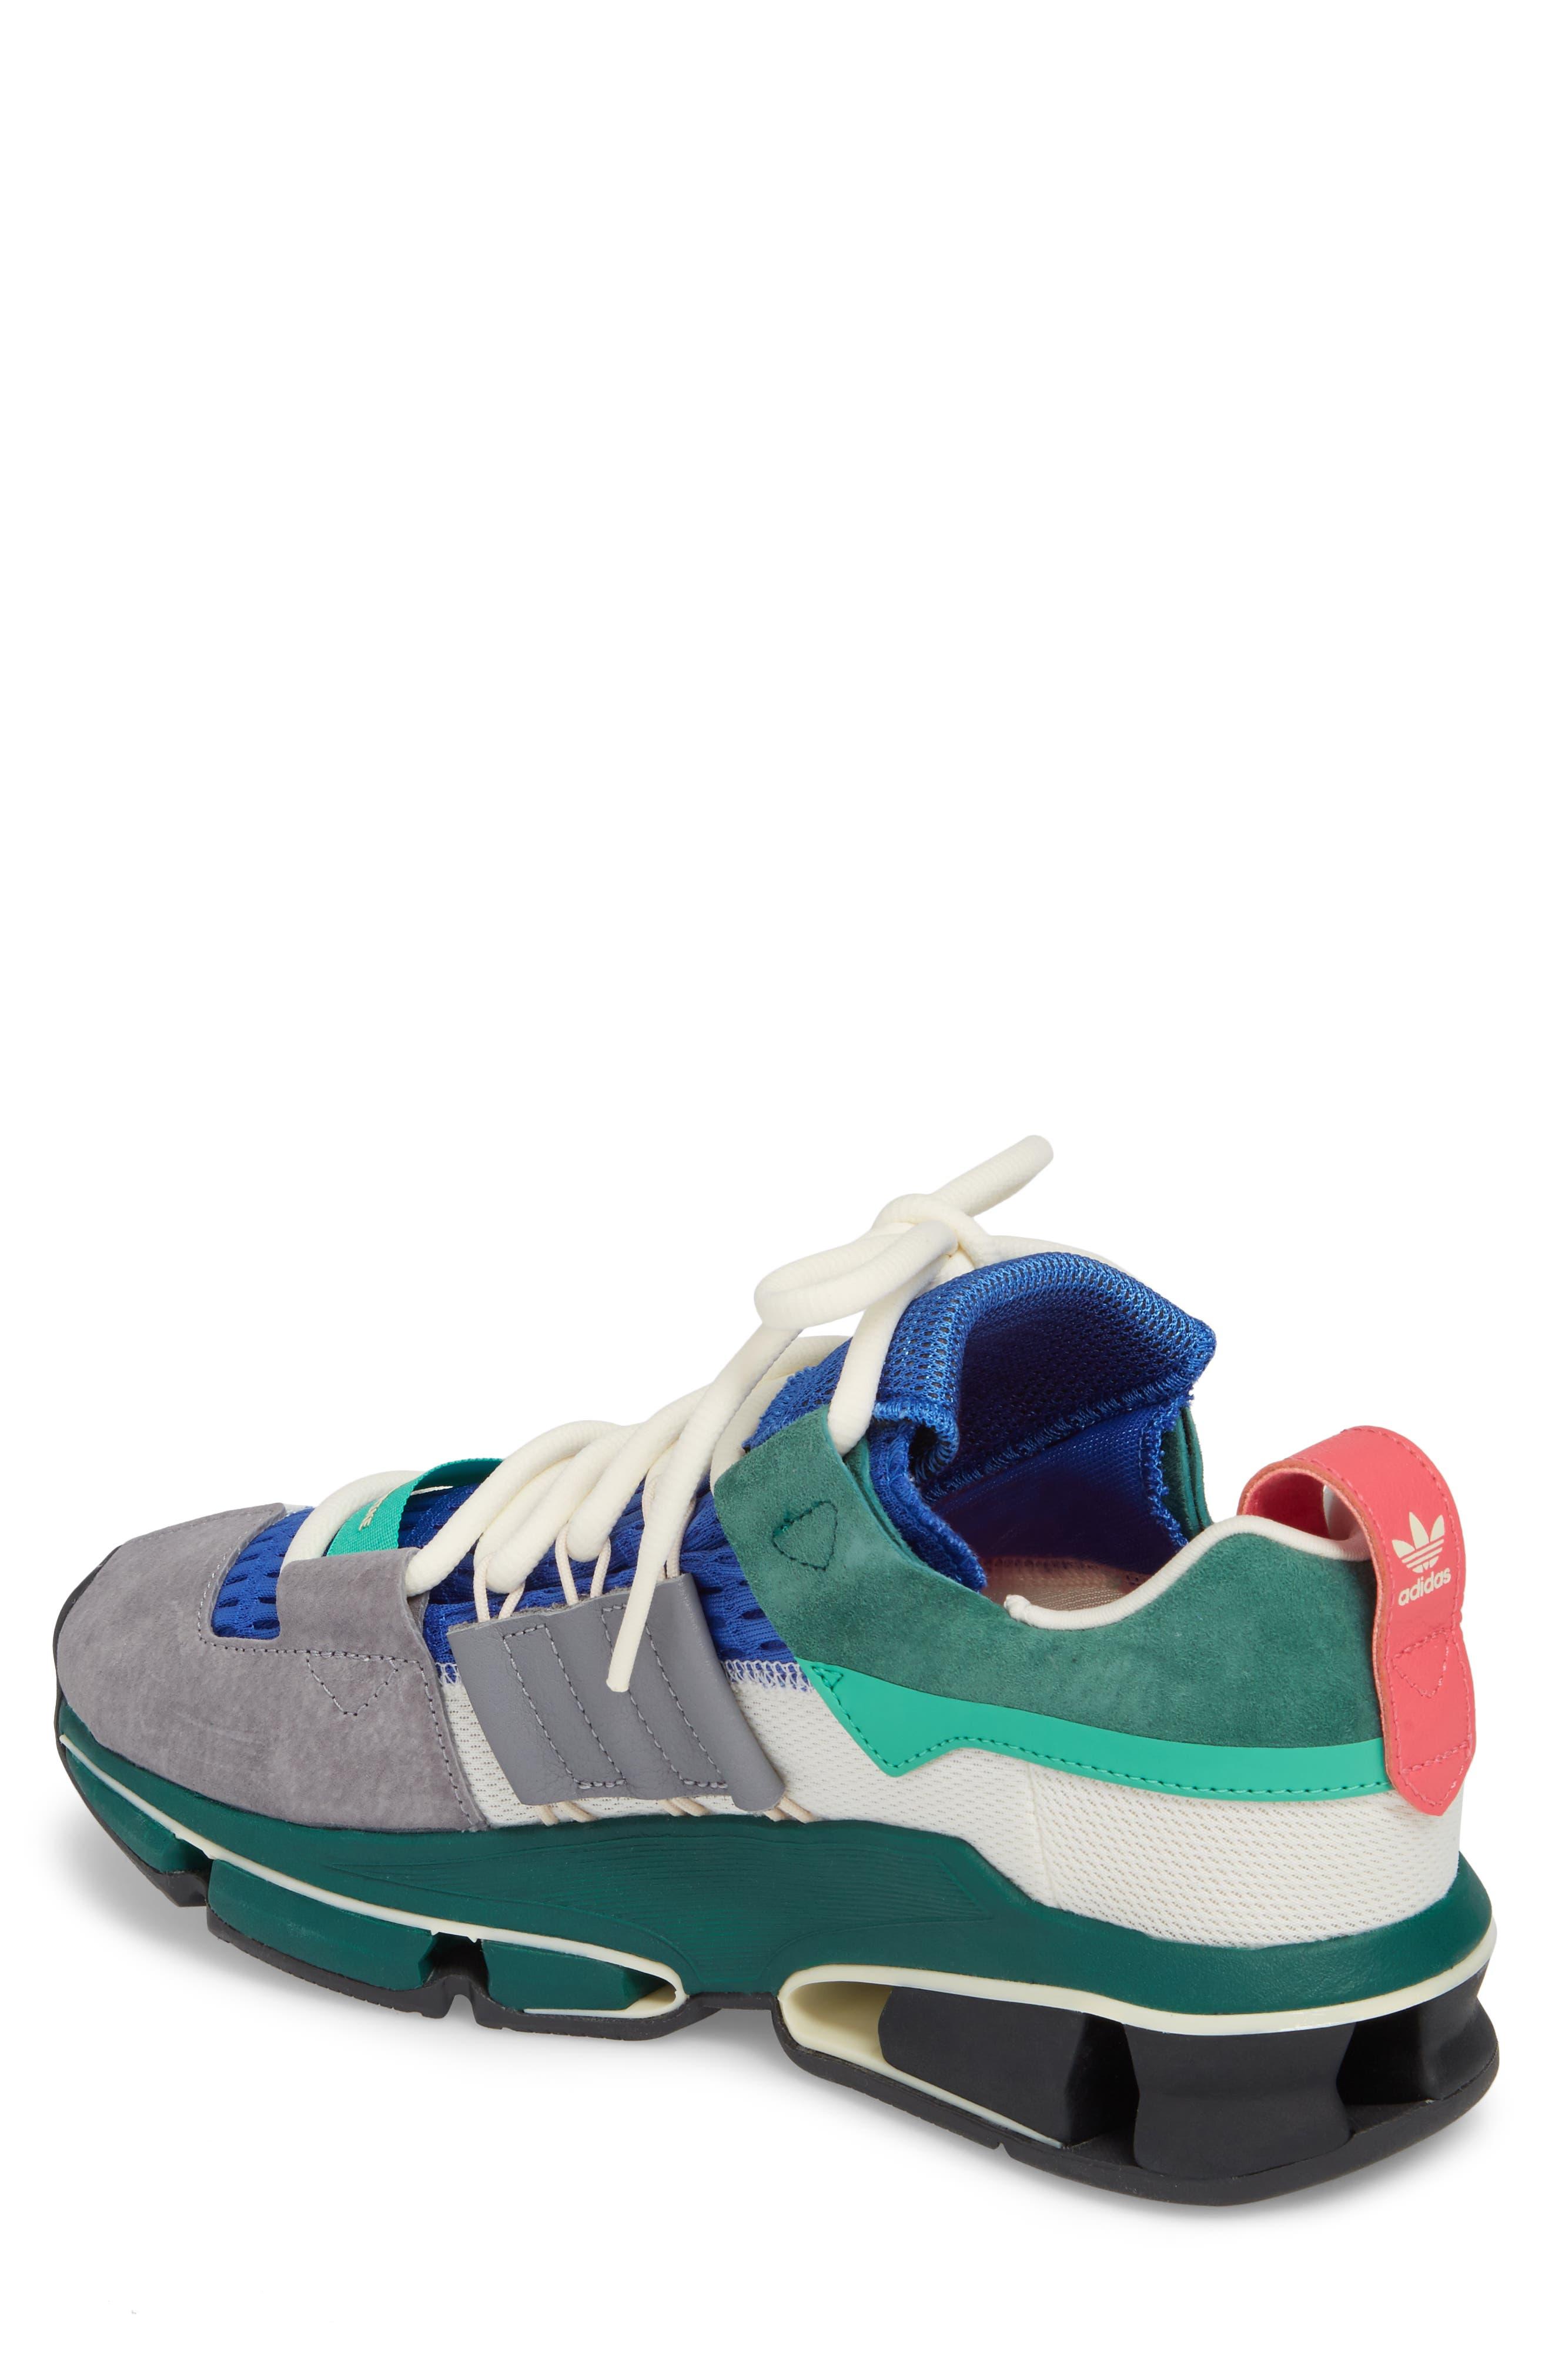 Twinstrike ADV Sneaker,                             Alternate thumbnail 2, color,                             400